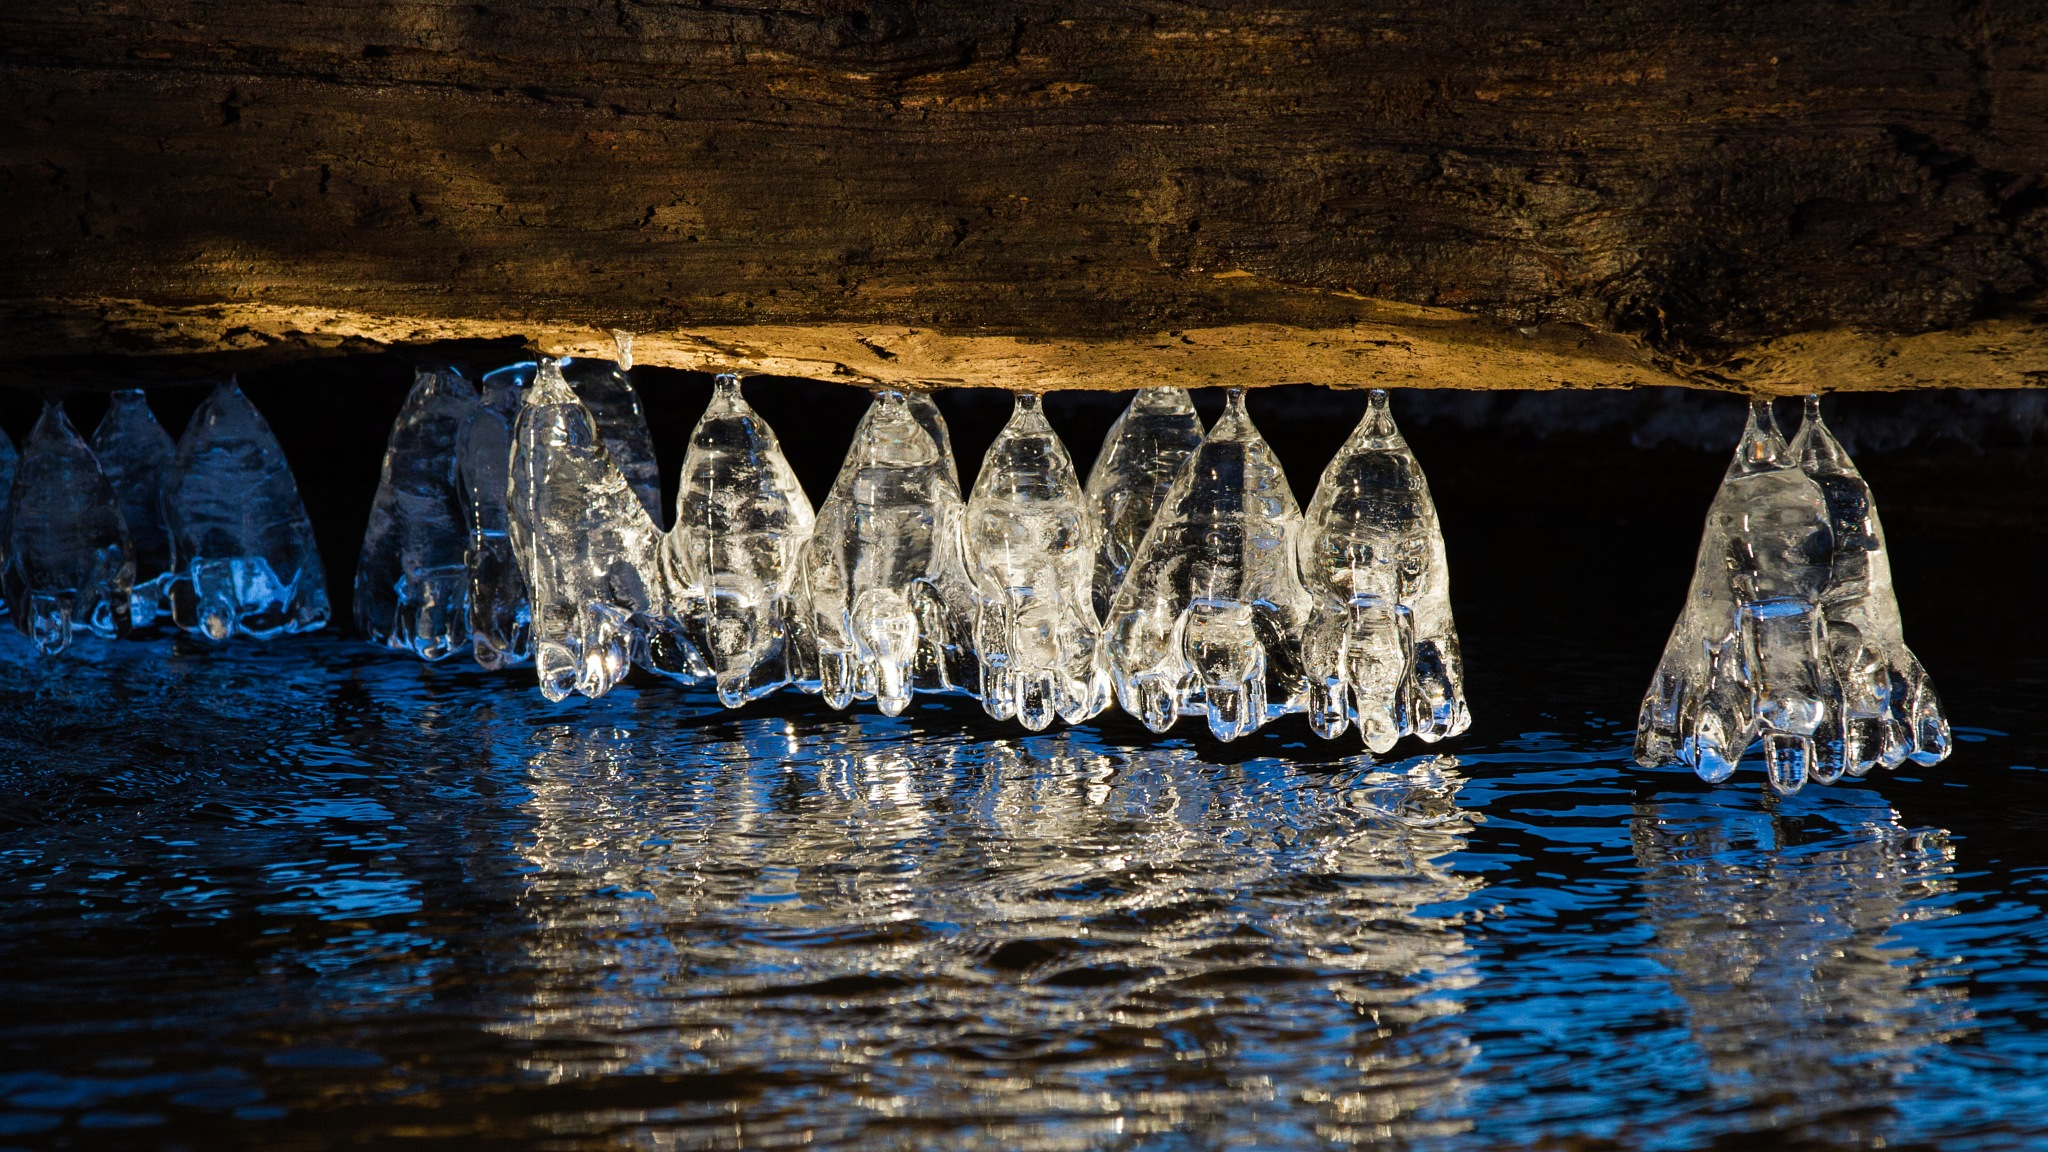 Ice Formation 02 by LancePangborn